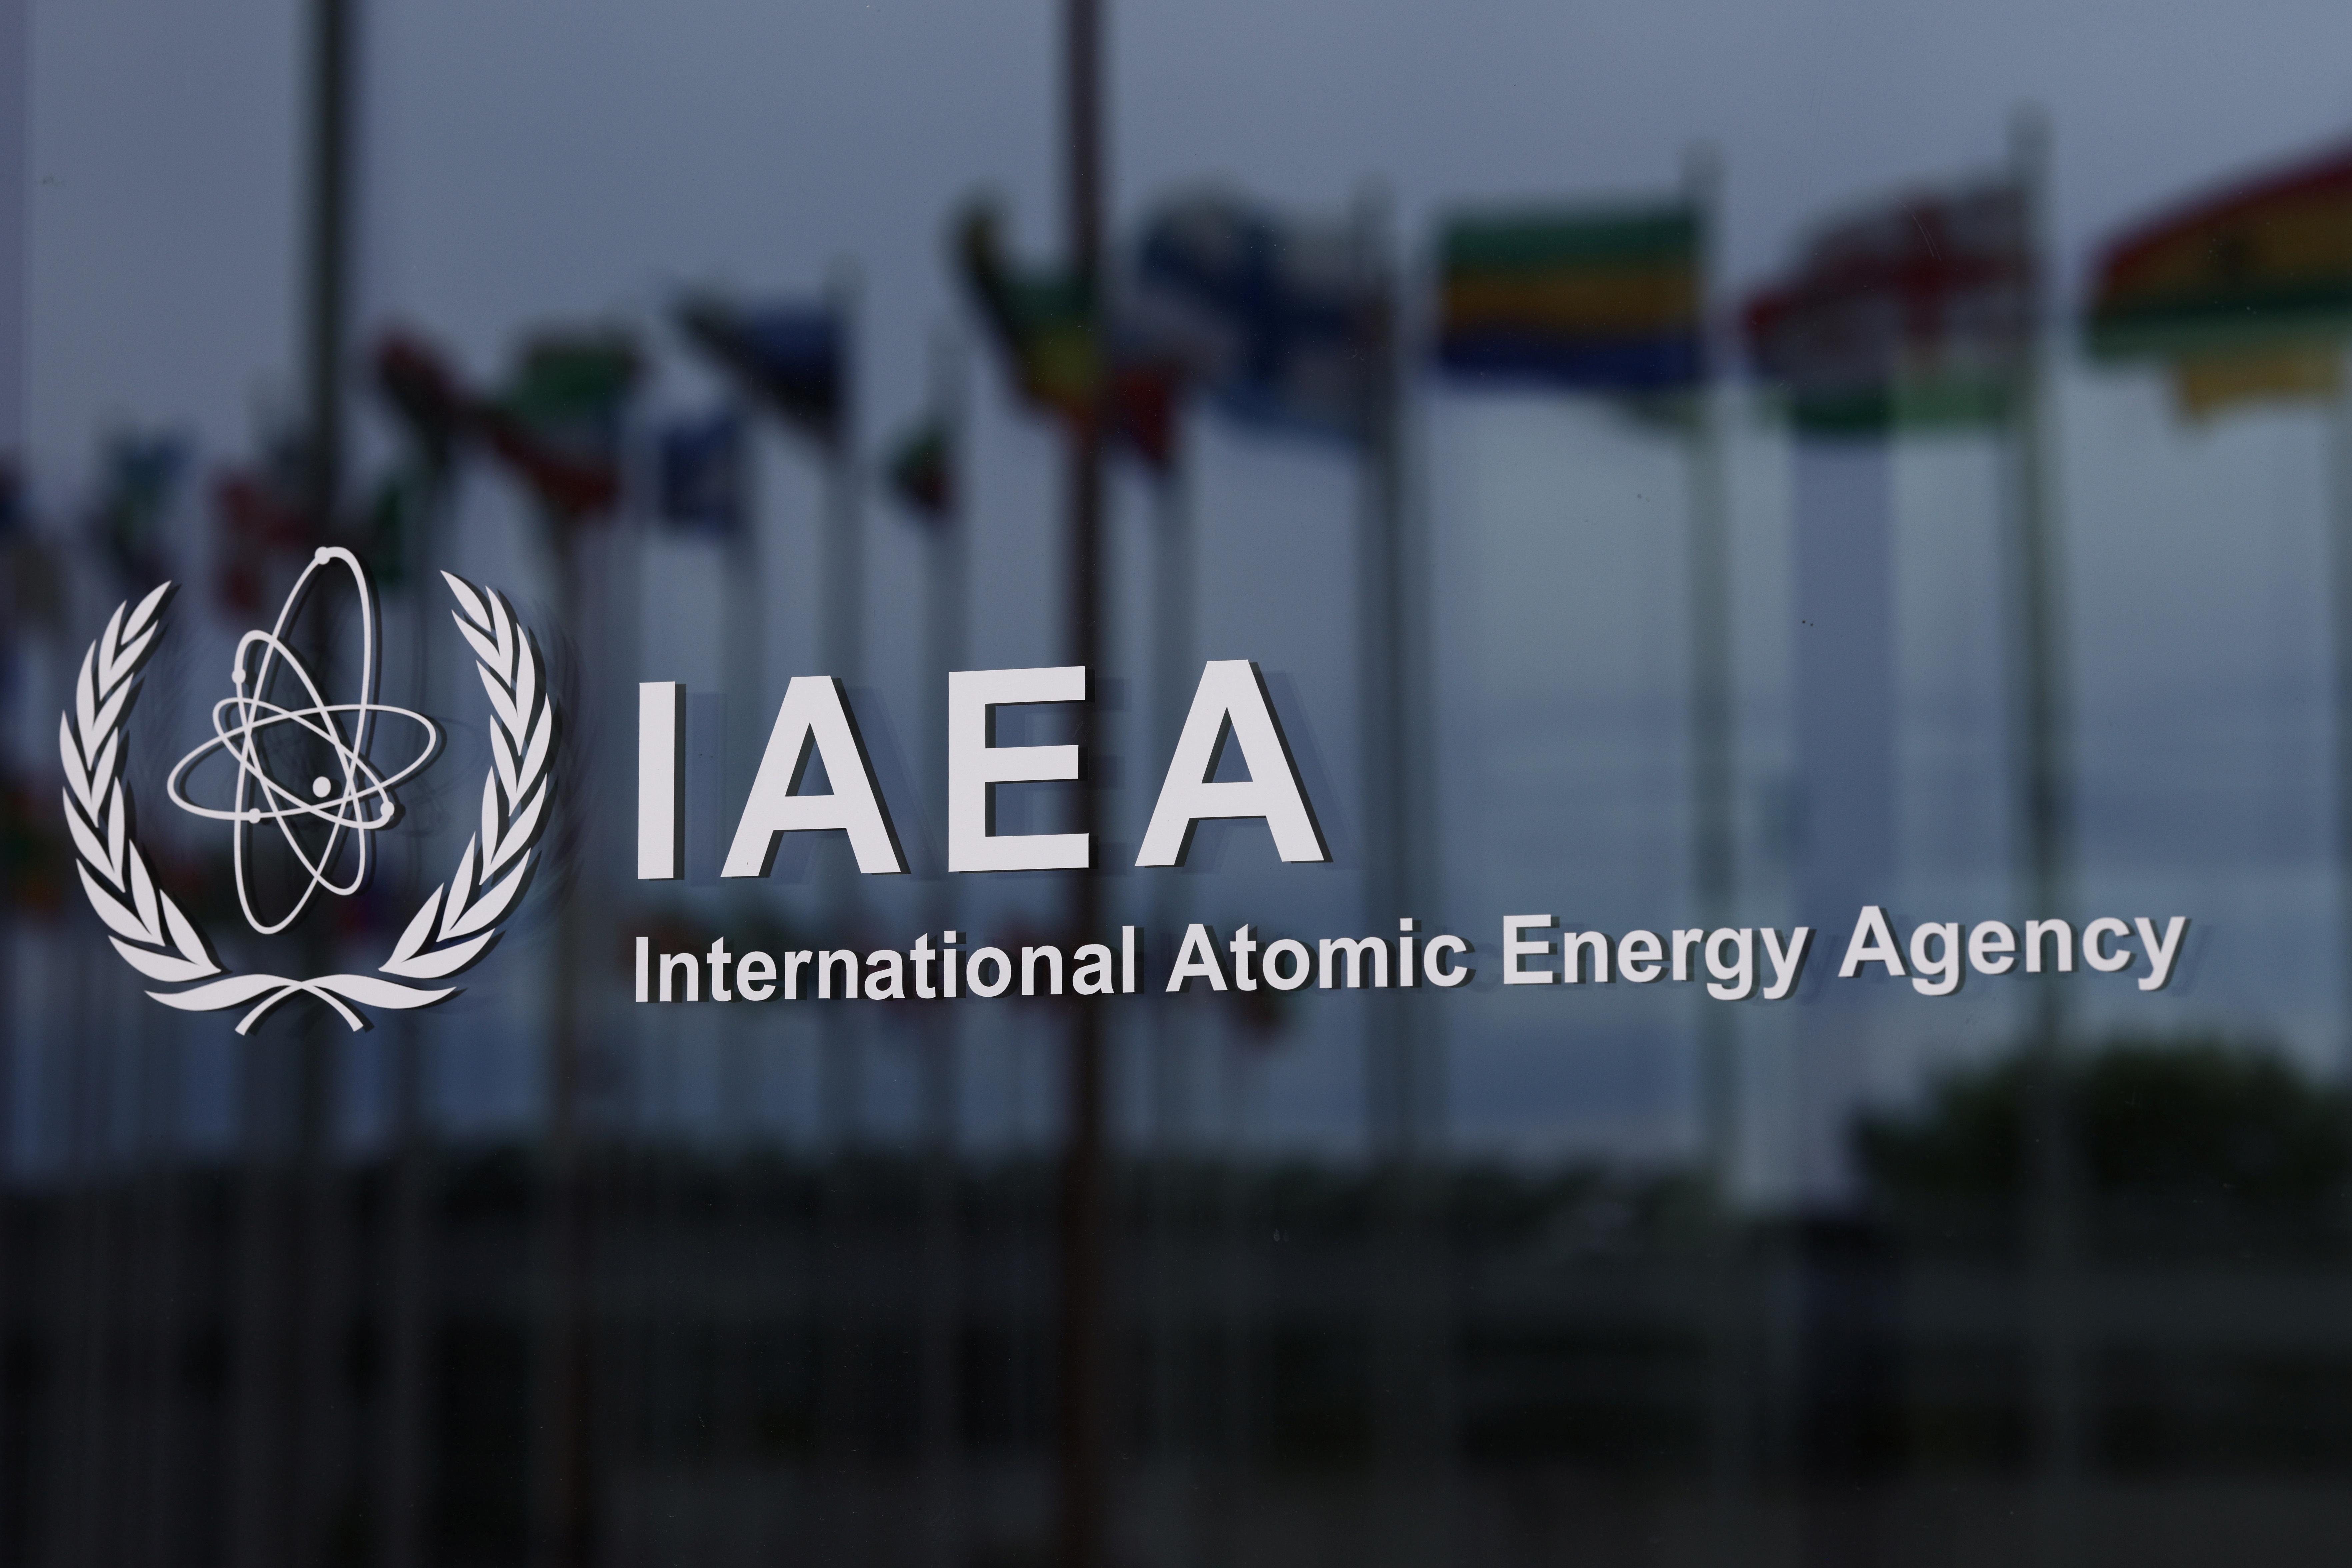 The logo of the International Atomic Energy Agency (IAEA) is seen at the IAEA headquarters, amid the coronavirus disease (COVID-19) pandemic, in Vienna, Austria May 24, 2021. REUTERS/Lisi Niesner